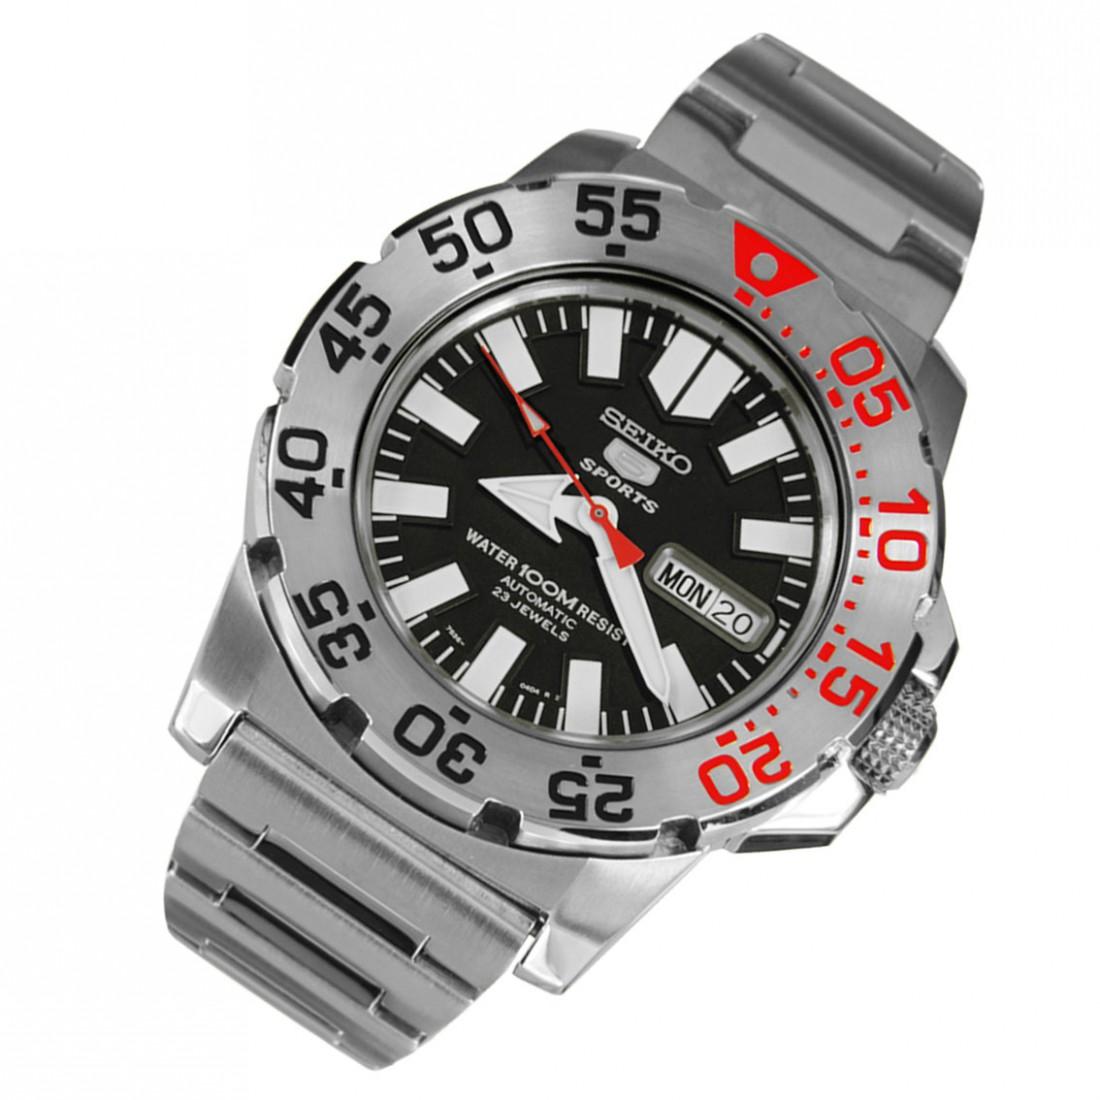 Seiko Automatic 5 Divers 23 Jewels SNZF47 SNZF47K1 SNZF47K Men's Watch